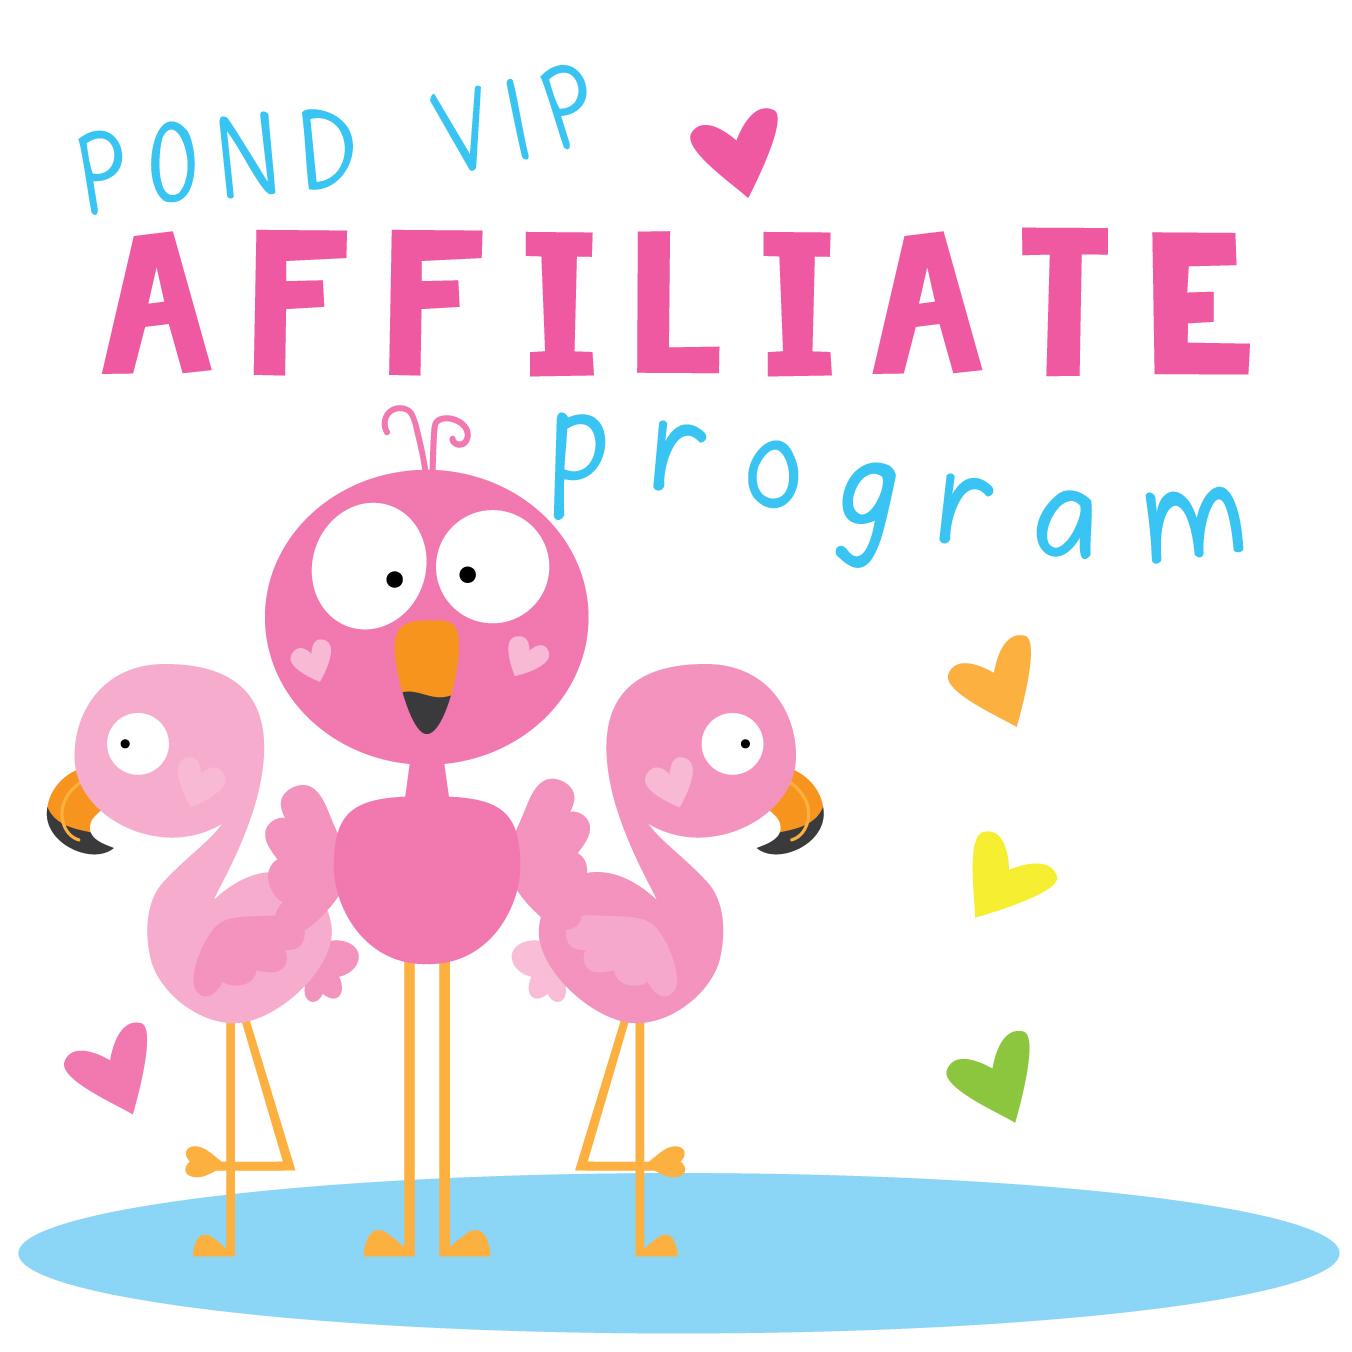 Pond VIP Affiliate